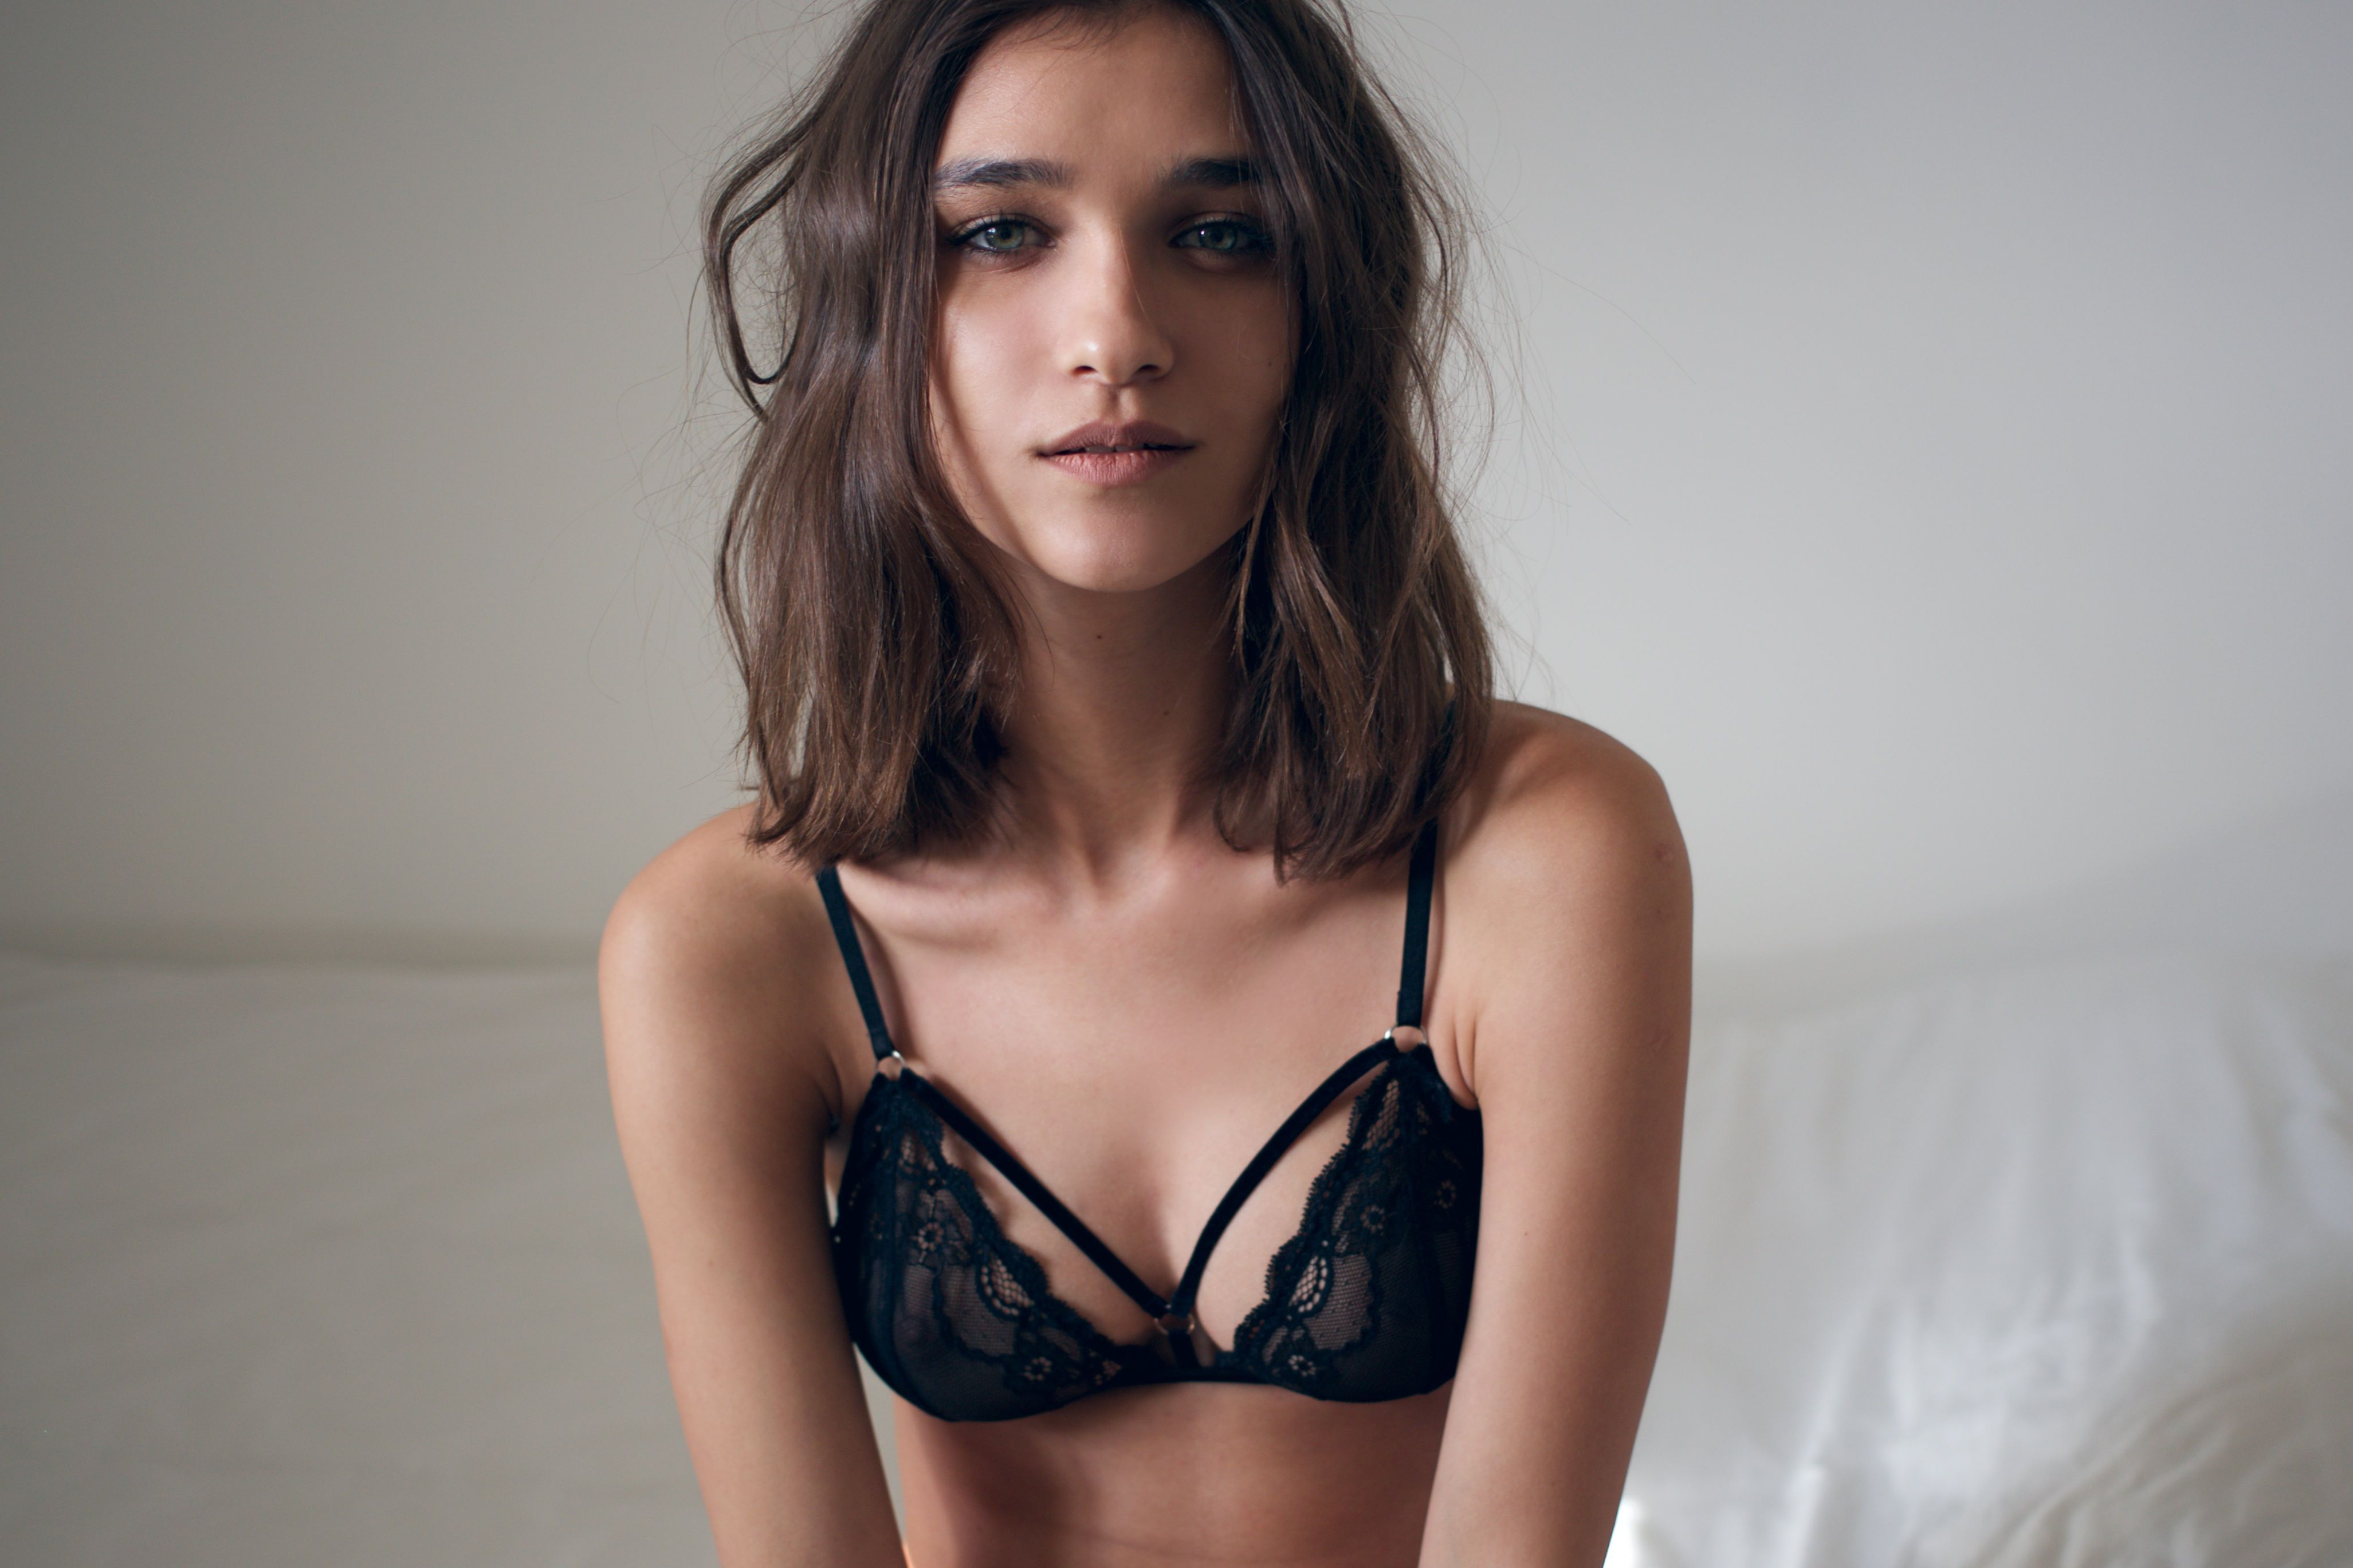 Paula-Bulczynska-Sexy-15